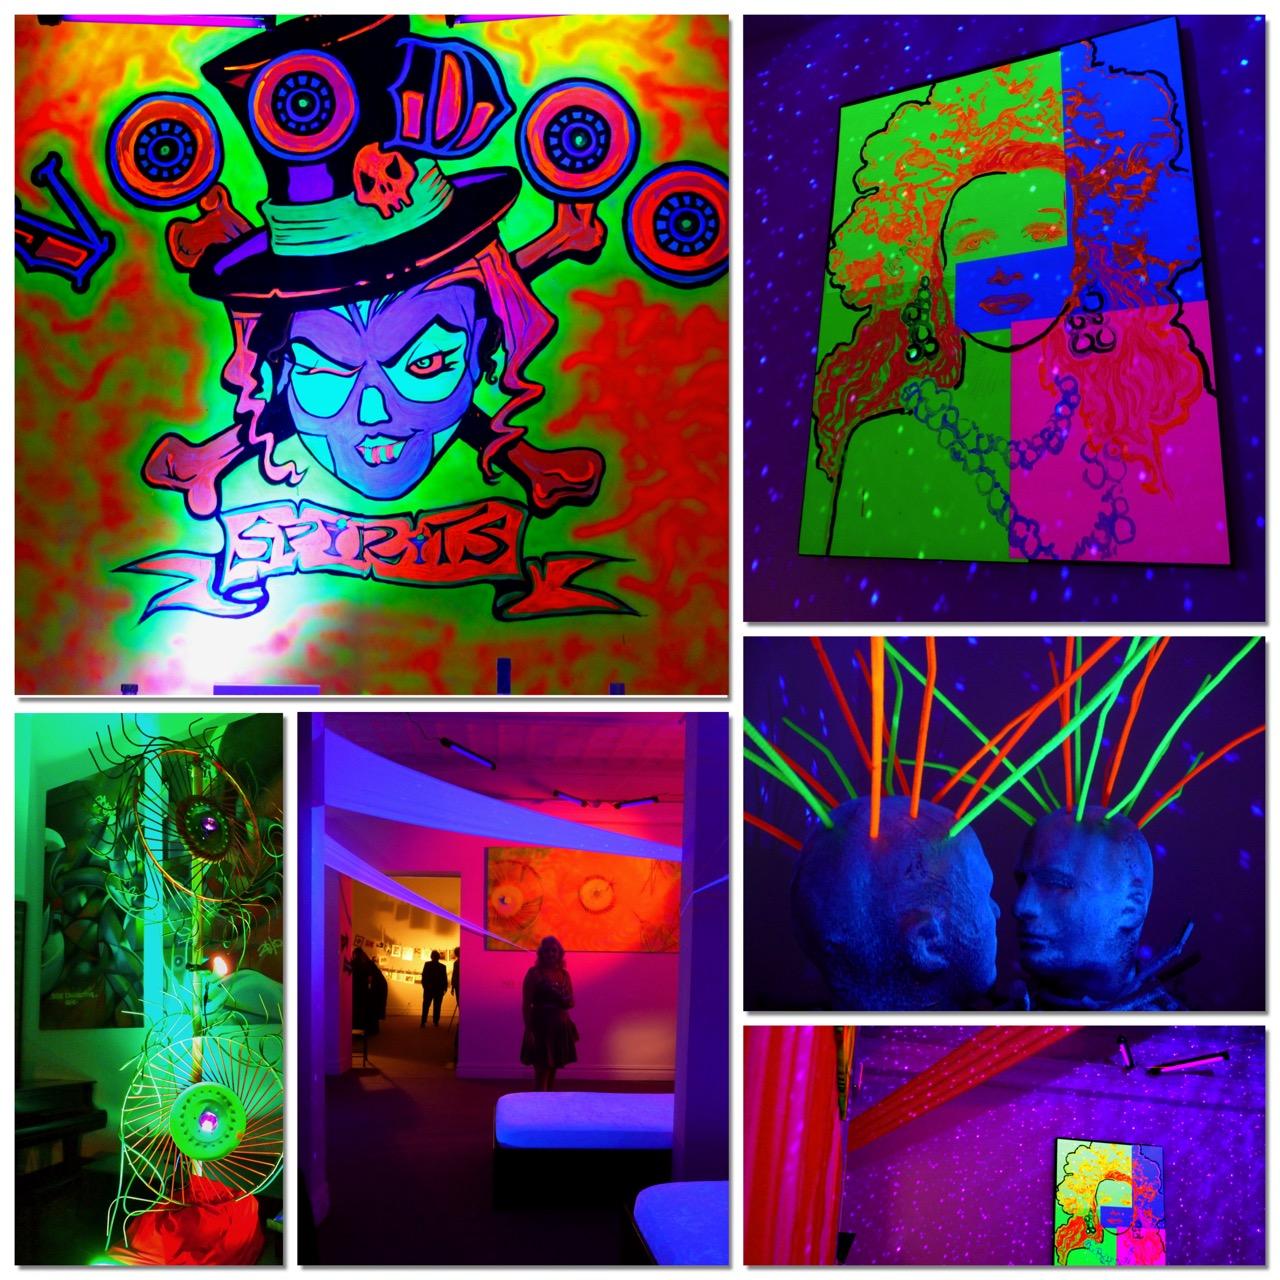 Eggsotic+Events+Black+Light+Party+Lighting+Rental+Halloween+Glow+Party+NJ+NYC++-+1.jpg